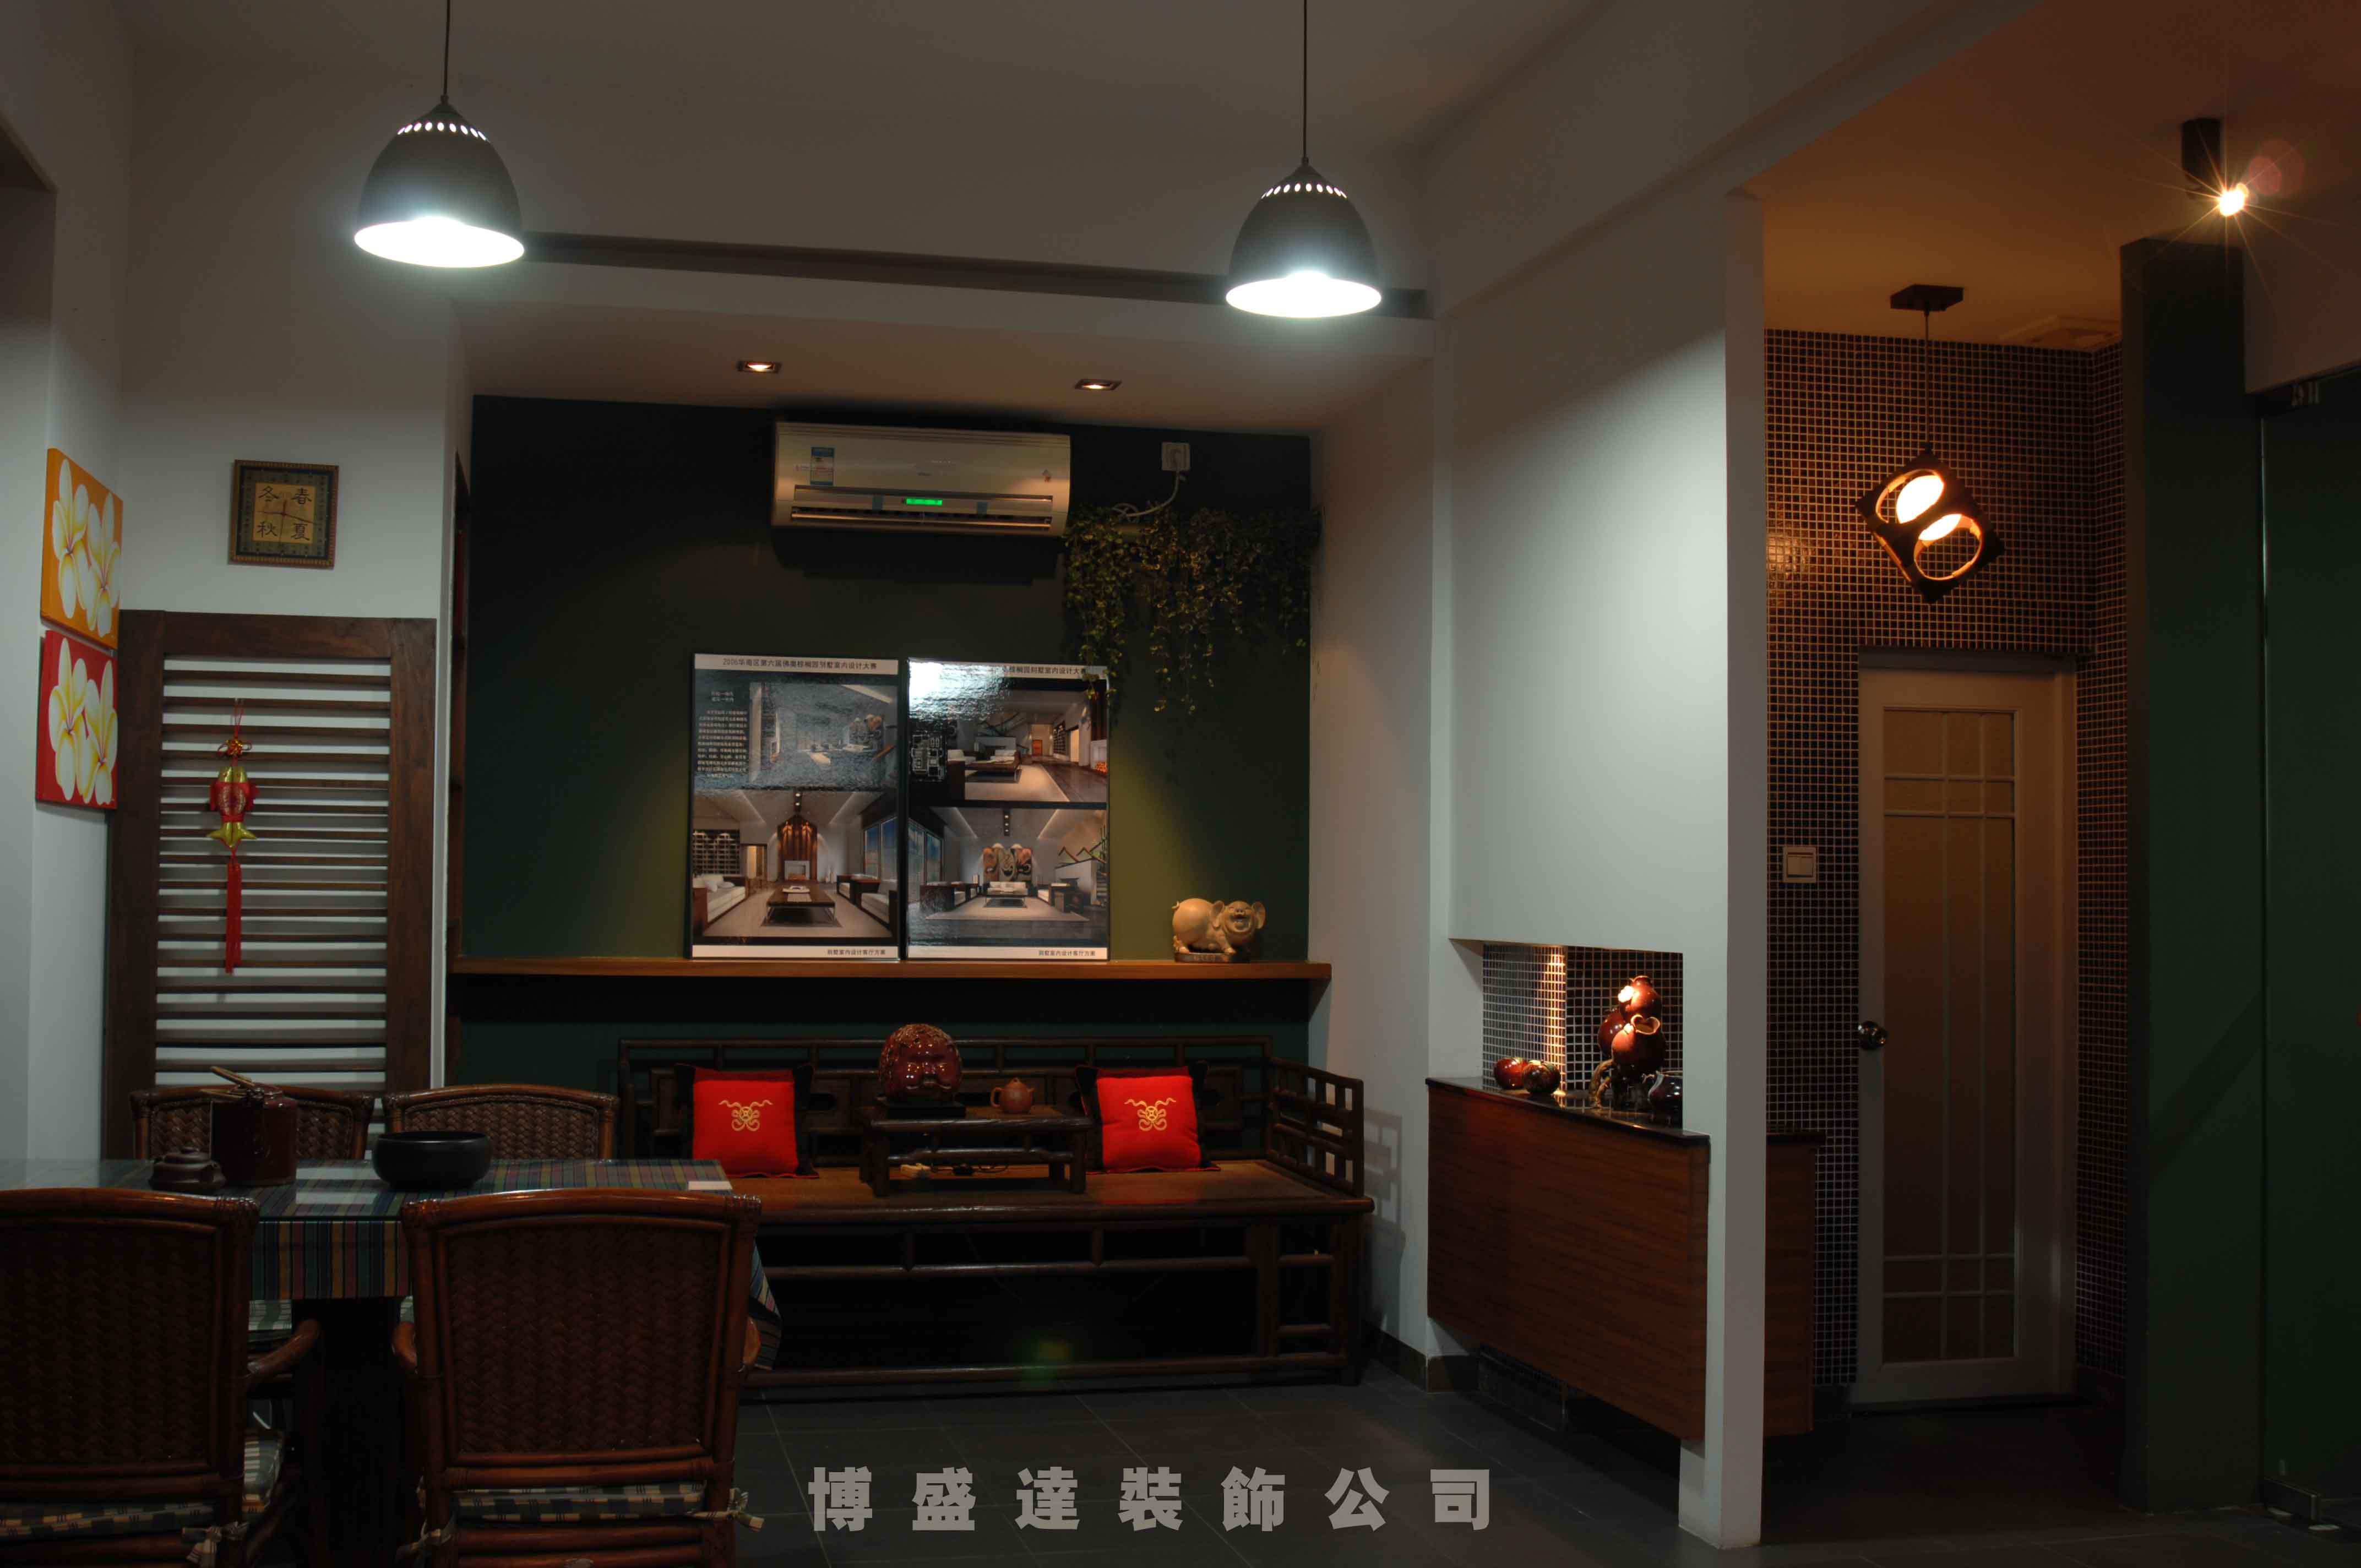 外贸公司办公室 外贸公司办公室平面图 外贸办公室